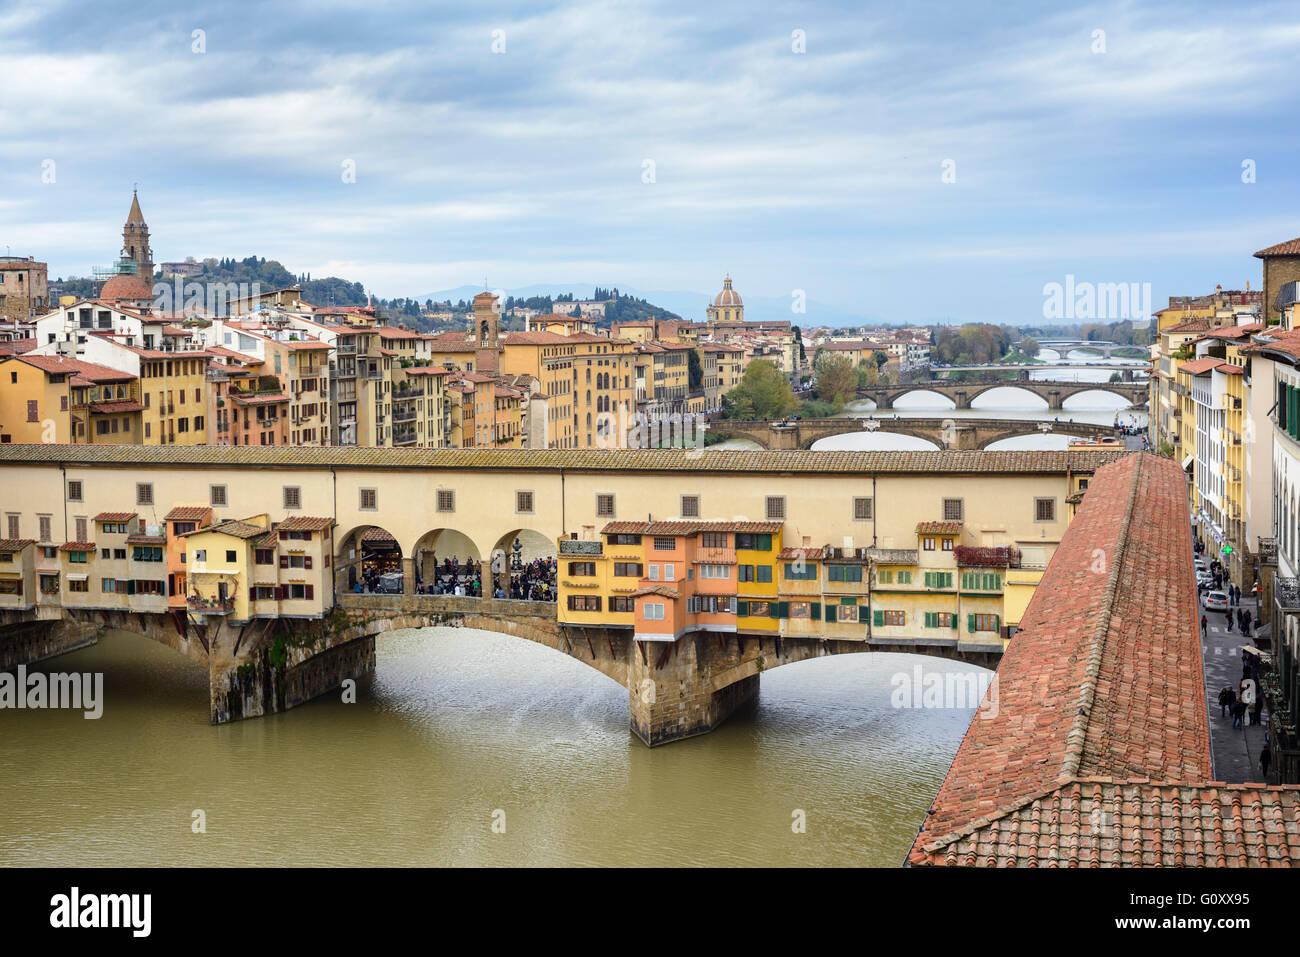 Florence. Italy. Ponte Vecchio and the Vasari Corridor crossing the River Arno. - Stock Image